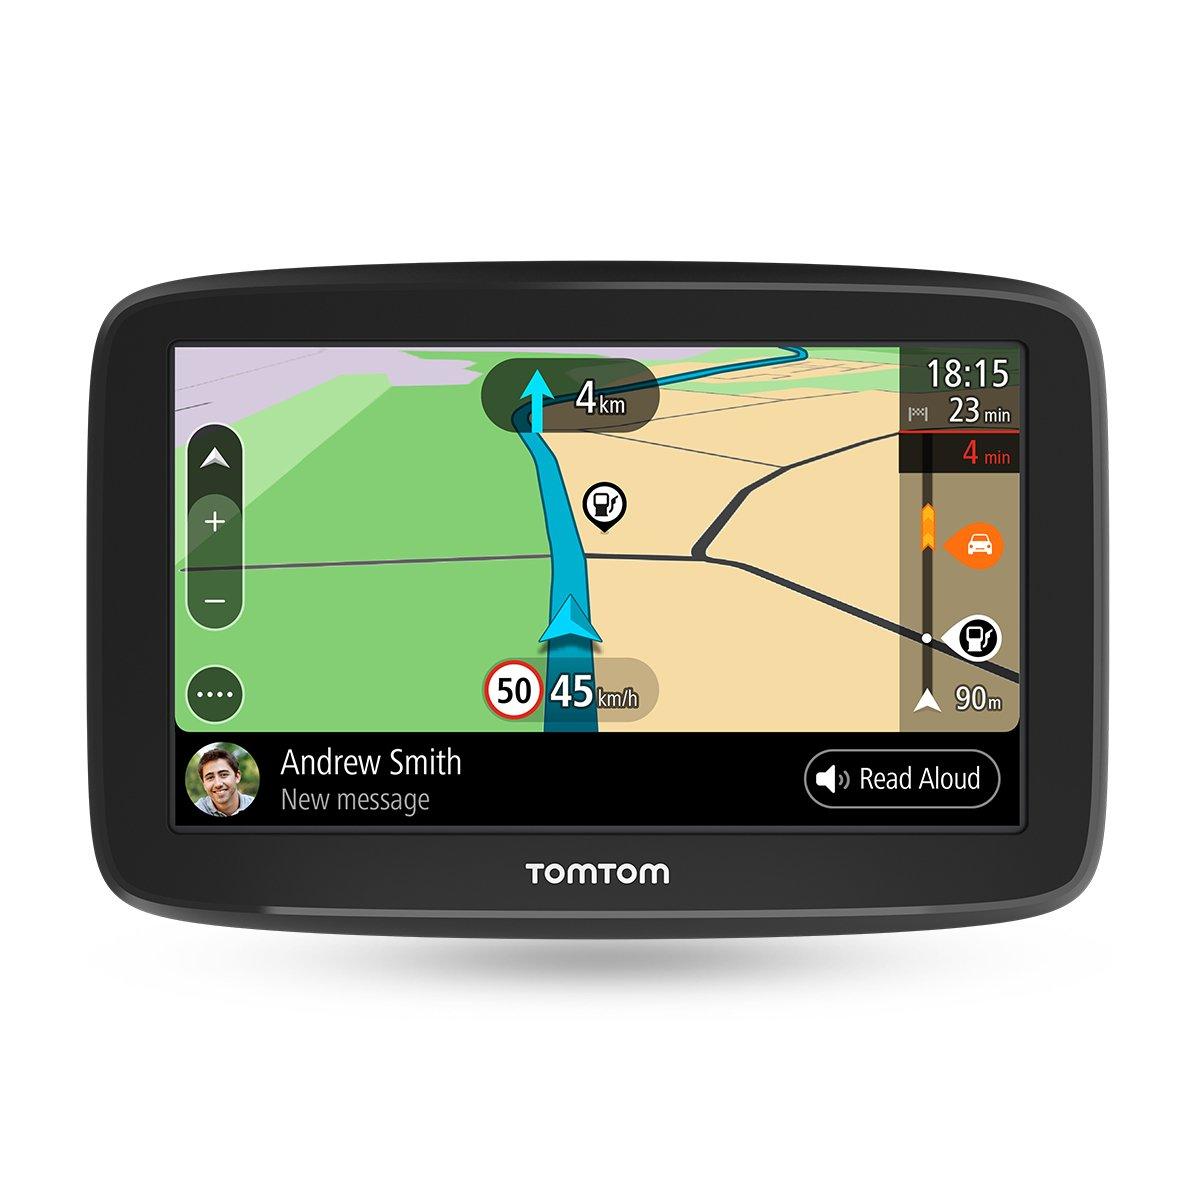 TomTom GO Basic Pkw-Navi (5 Zoll, mit Updates ü ber Wi-Fi, Lebenslang Traffic via Smartphone und EU-Karten, Smartphone-Benachrichtigungen, resistivem Display) 1BA5.002.01